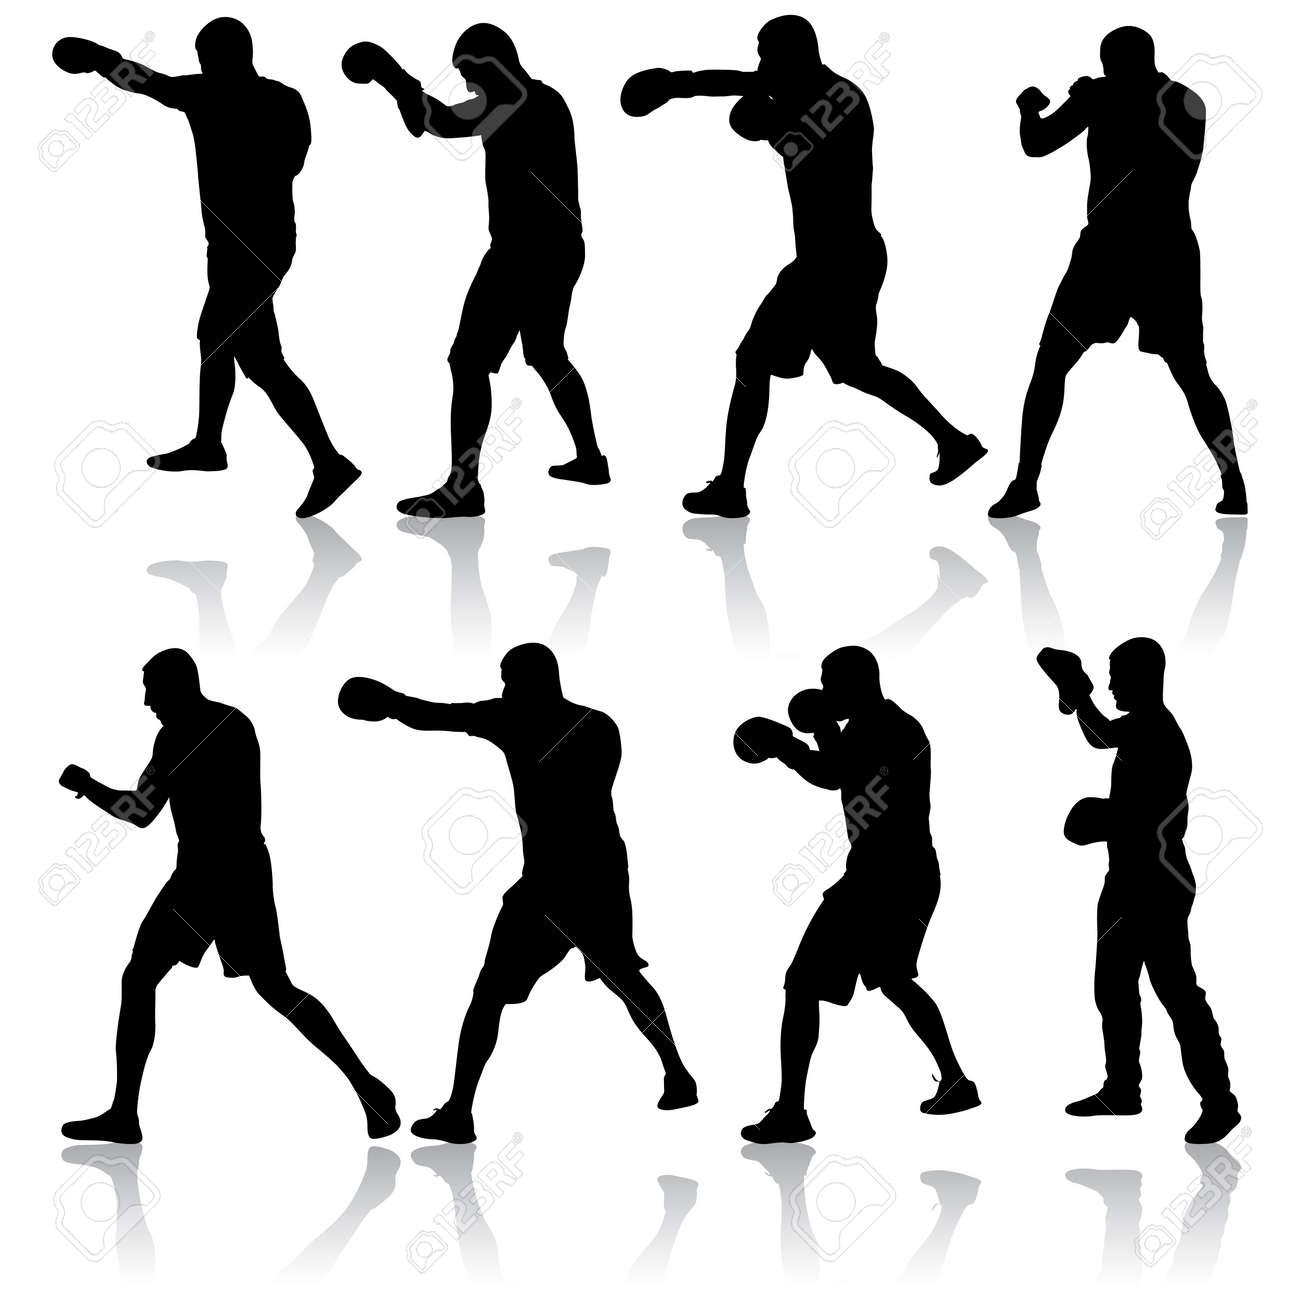 Black set silhouette of an athlete boxer on a white background. - 147442737